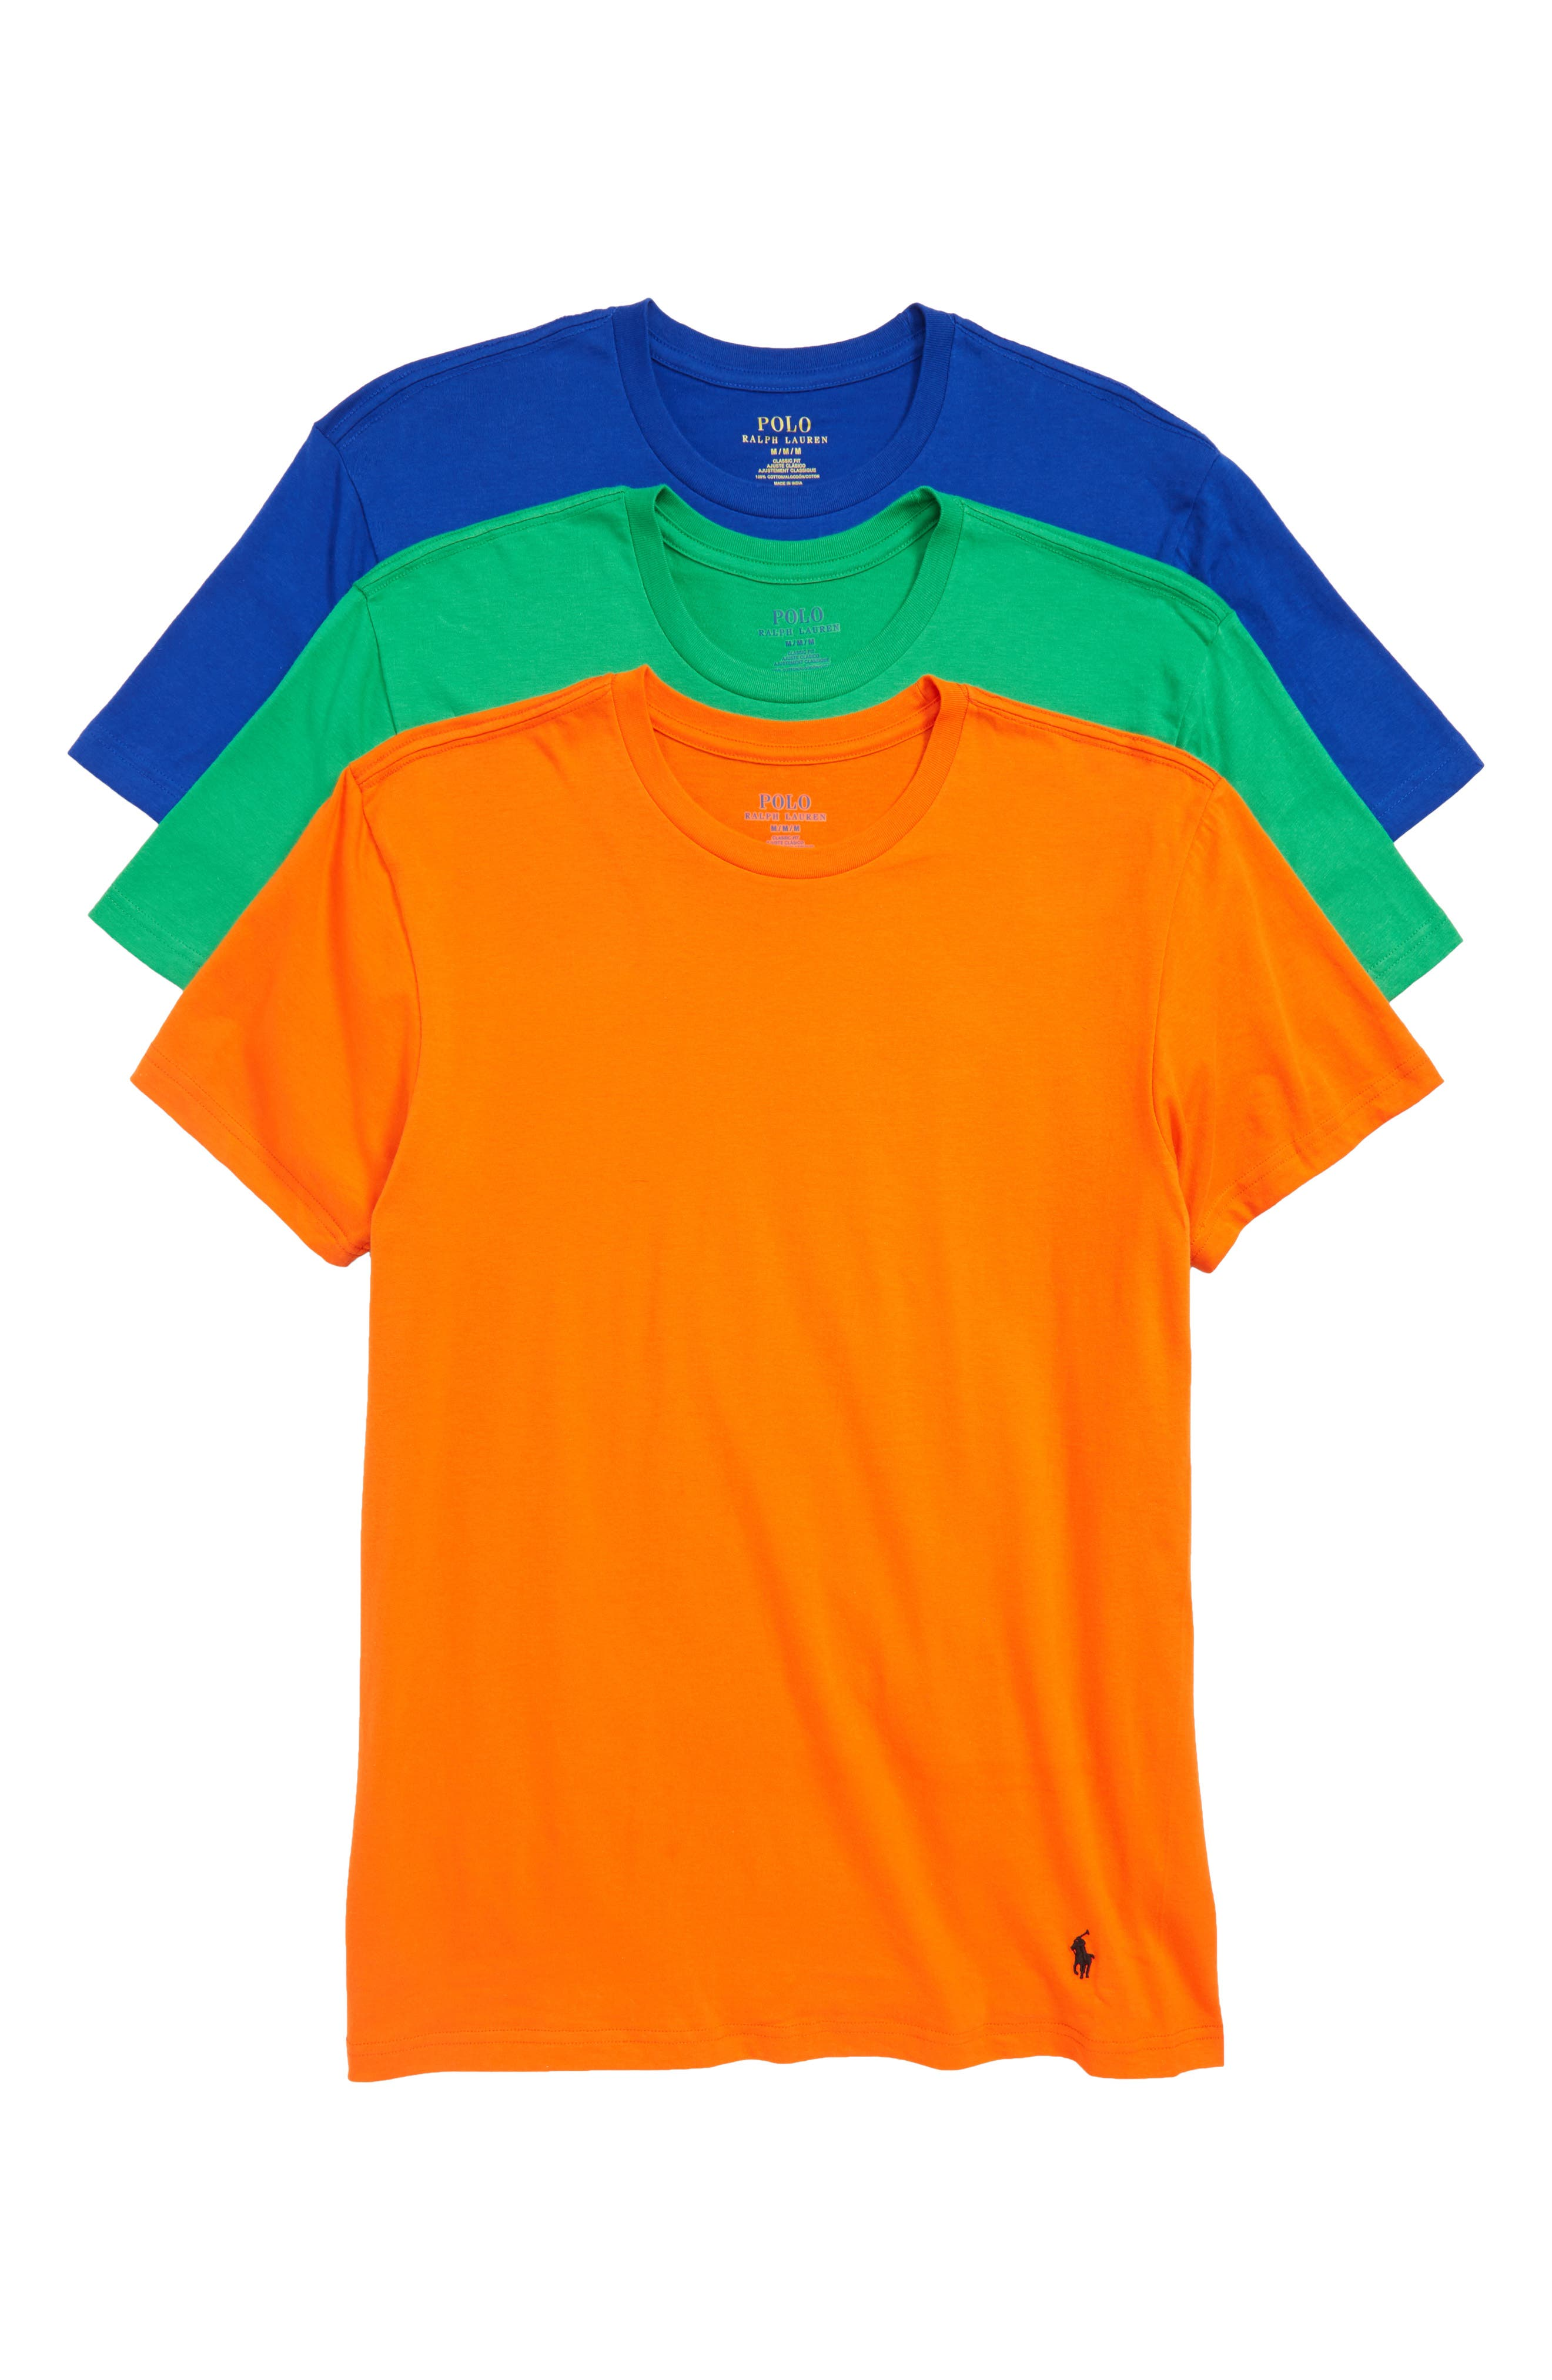 3-Pack Classic Fit T-Shirts,                             Main thumbnail 1, color,                             ORANGE/ GREEN/ ROYAL